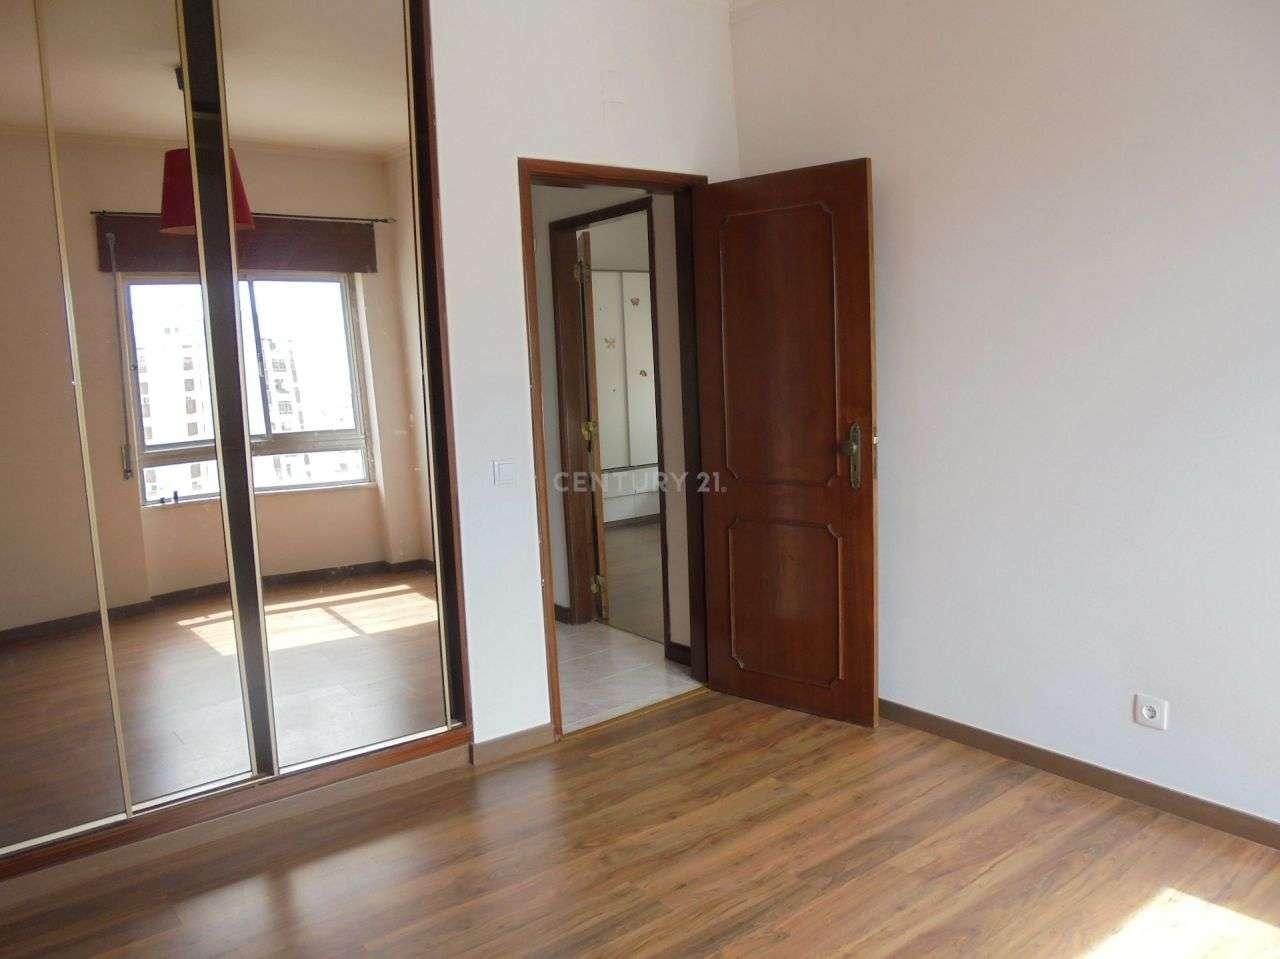 Apartamento para comprar, Póvoa de Santa Iria e Forte da Casa, Vila Franca de Xira, Lisboa - Foto 5